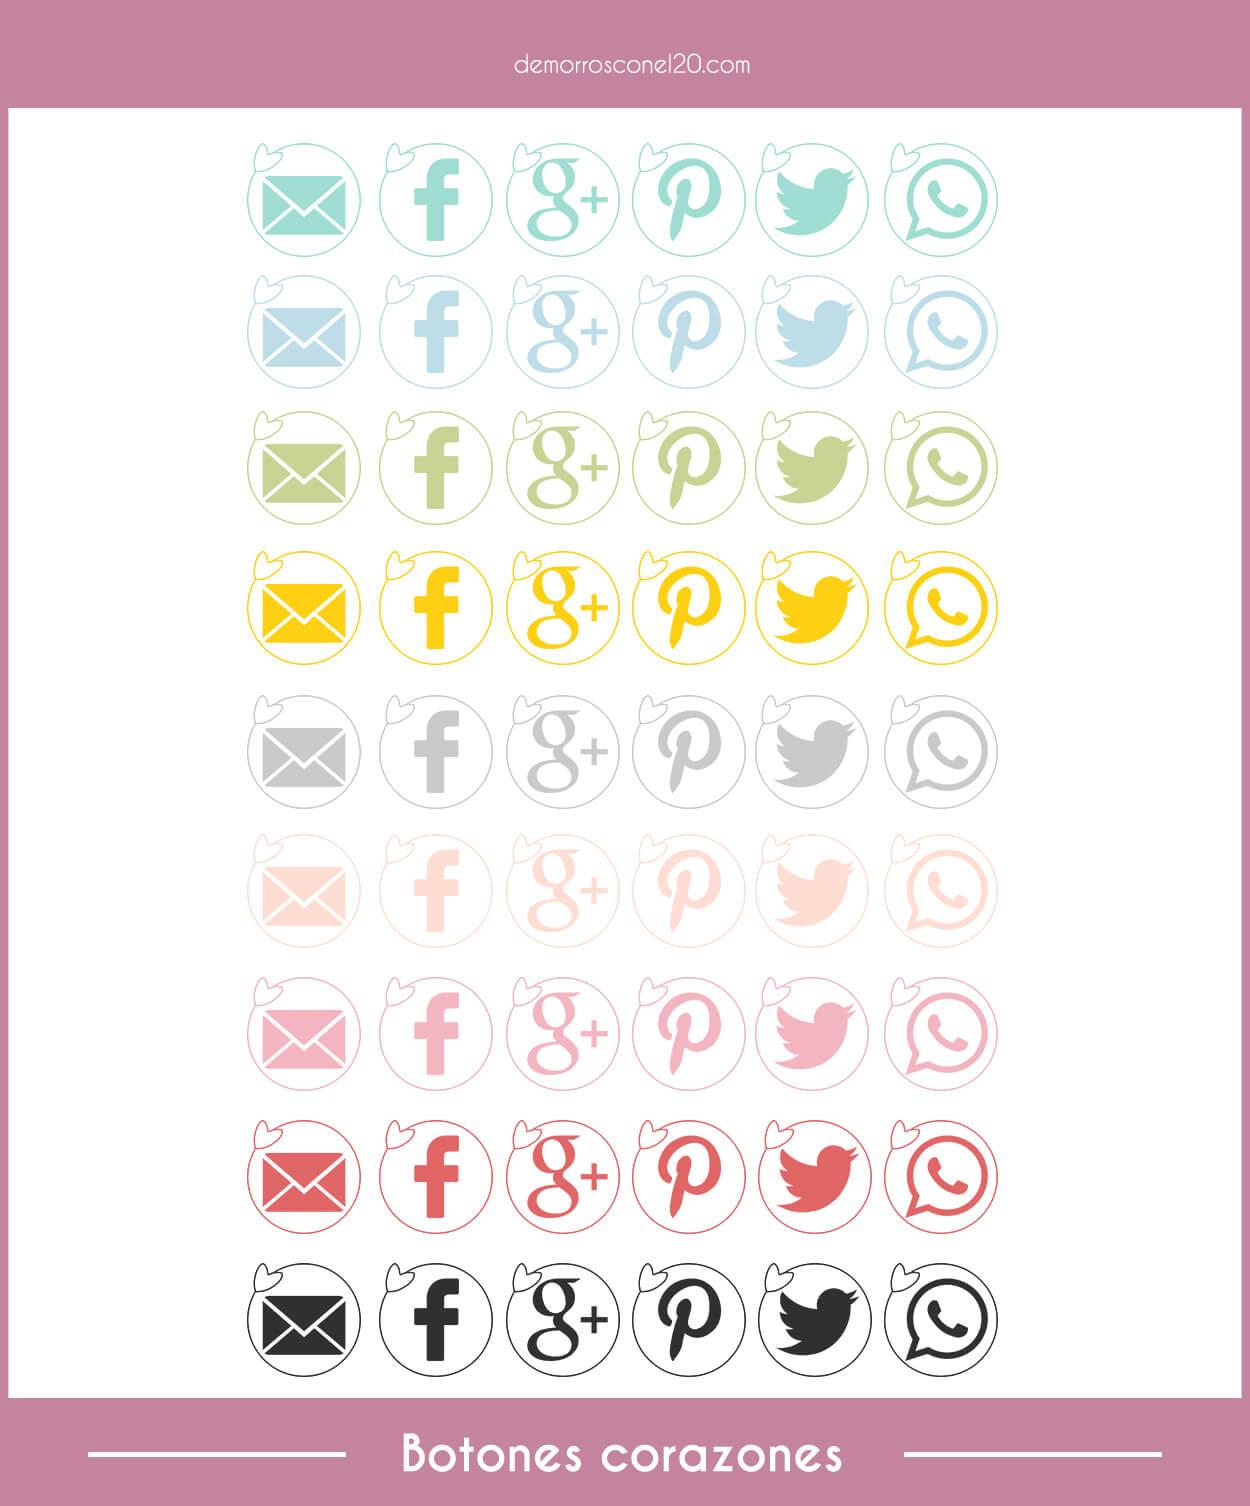 botones-redes-sociales-png-freebies